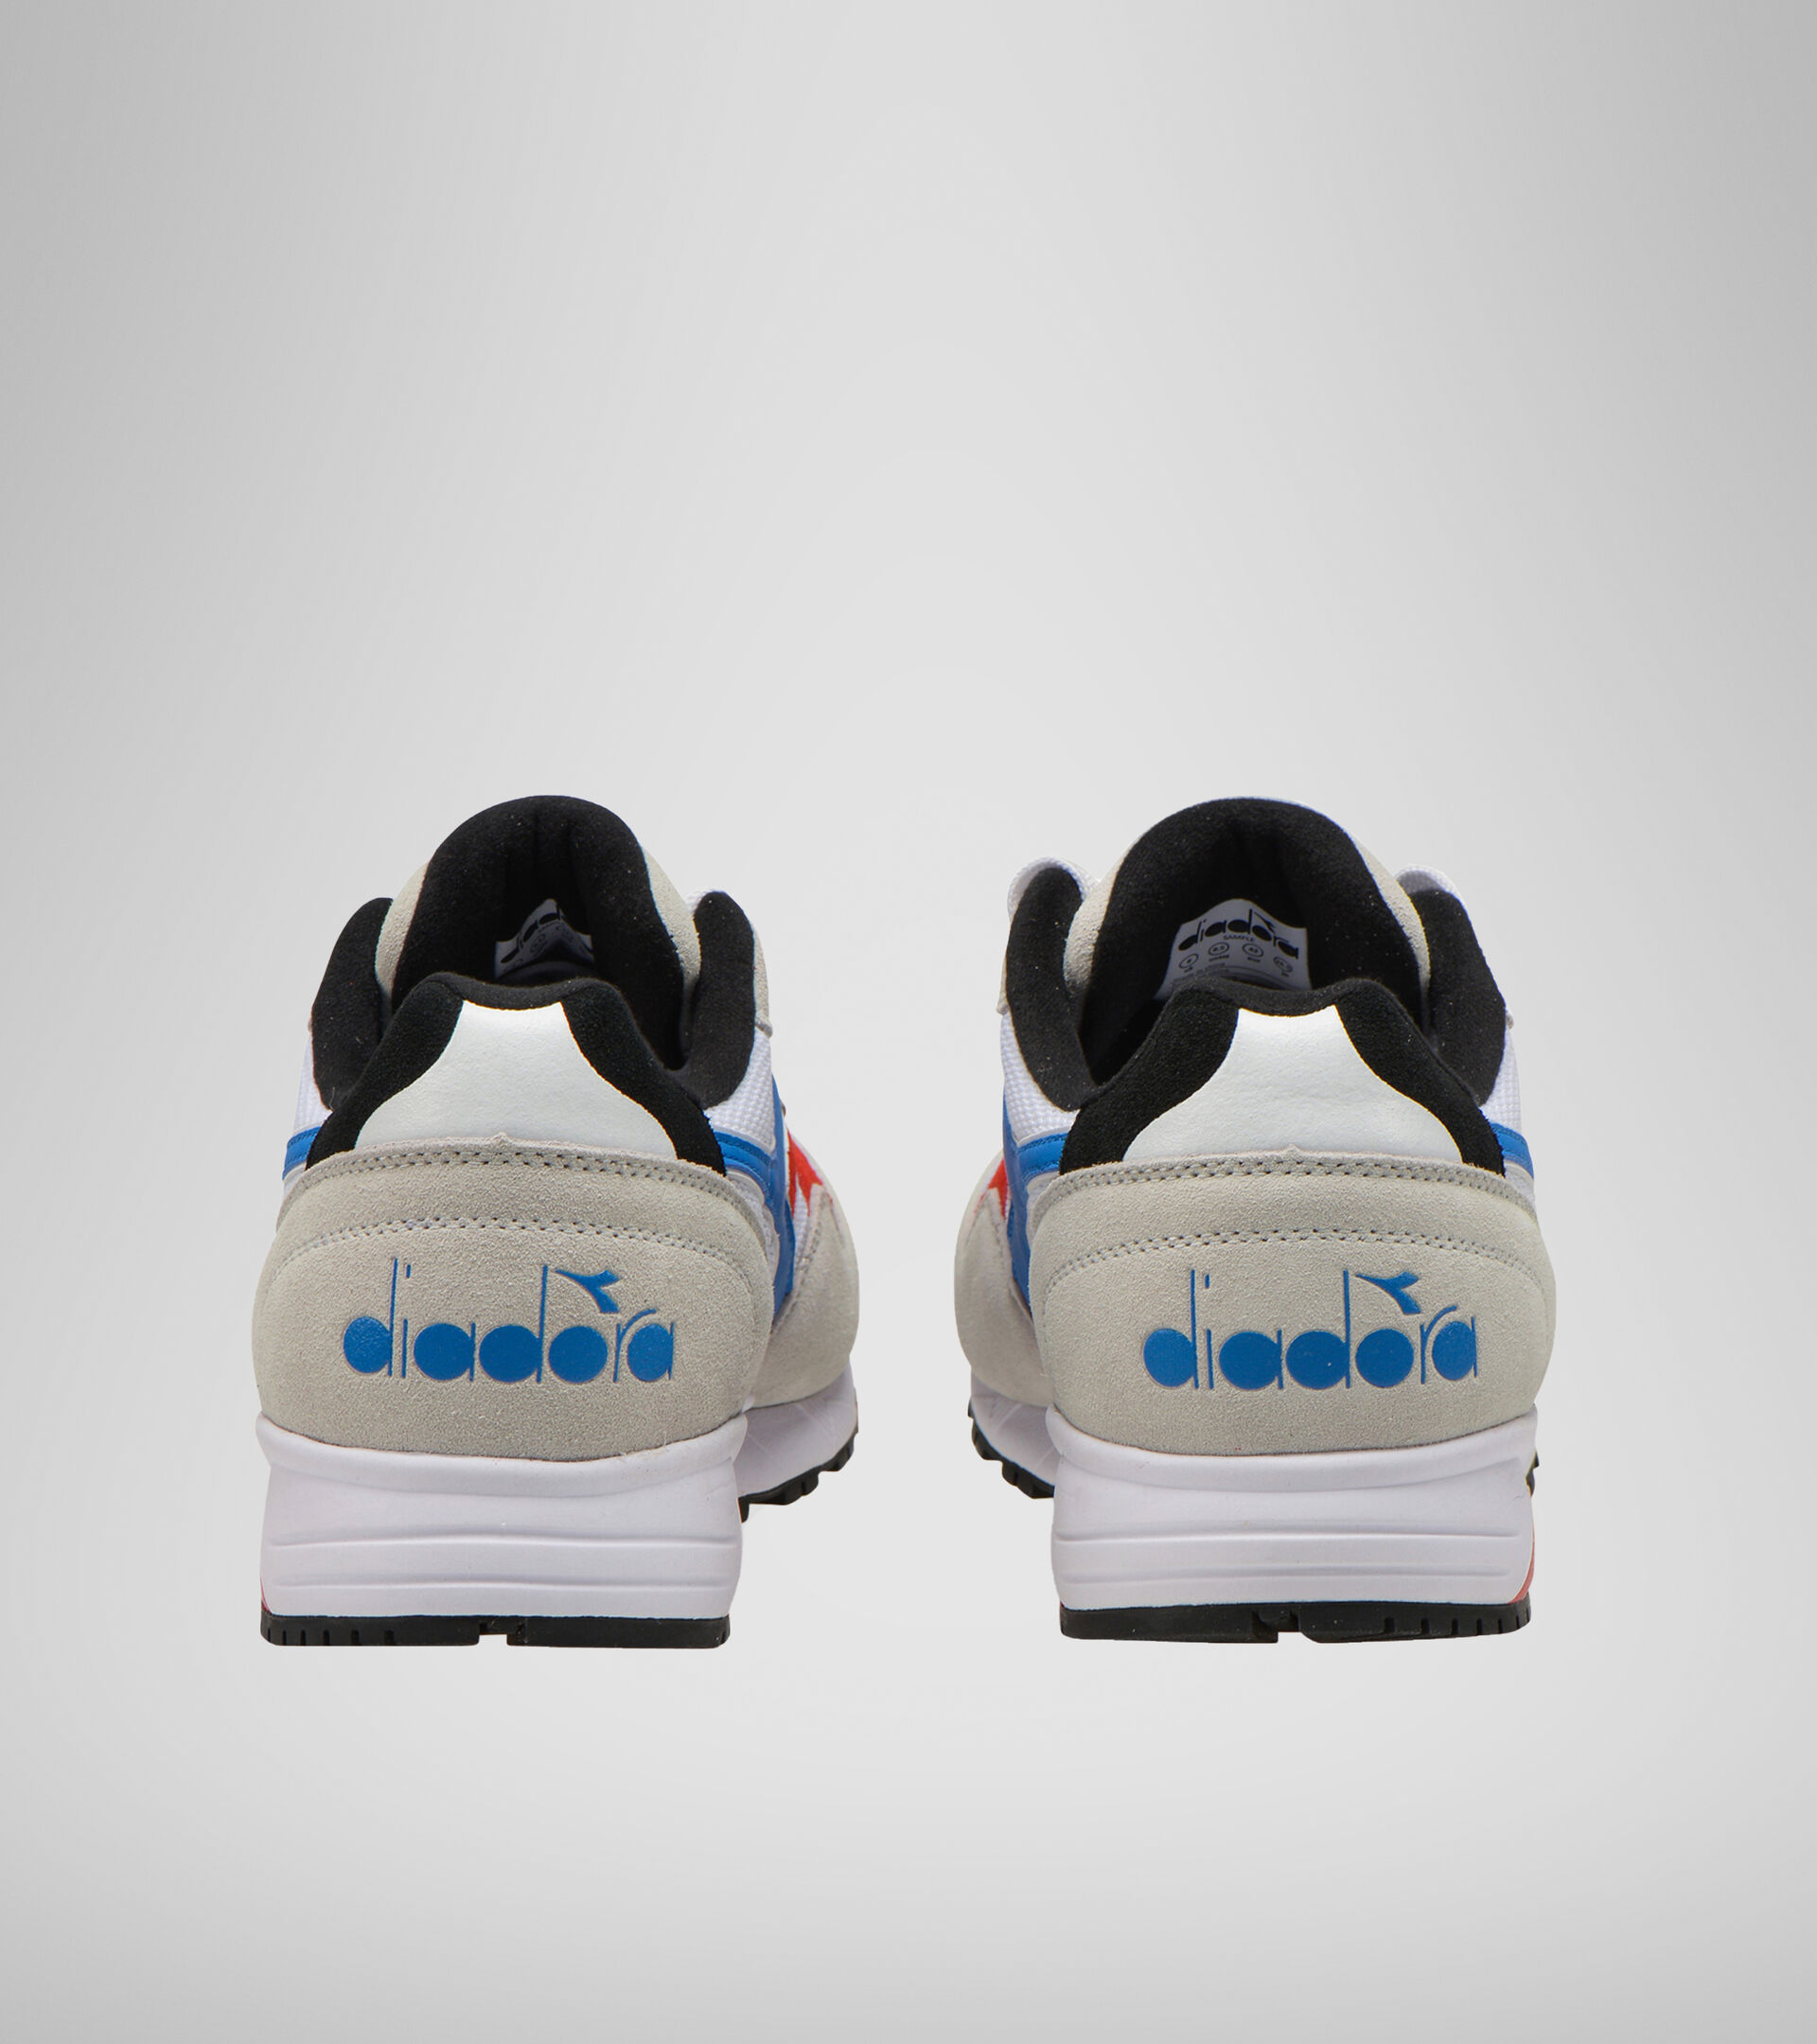 Sneaker - Unisex N902 S WSS/LEUCHTEND BLAU/FEUERROT - Diadora